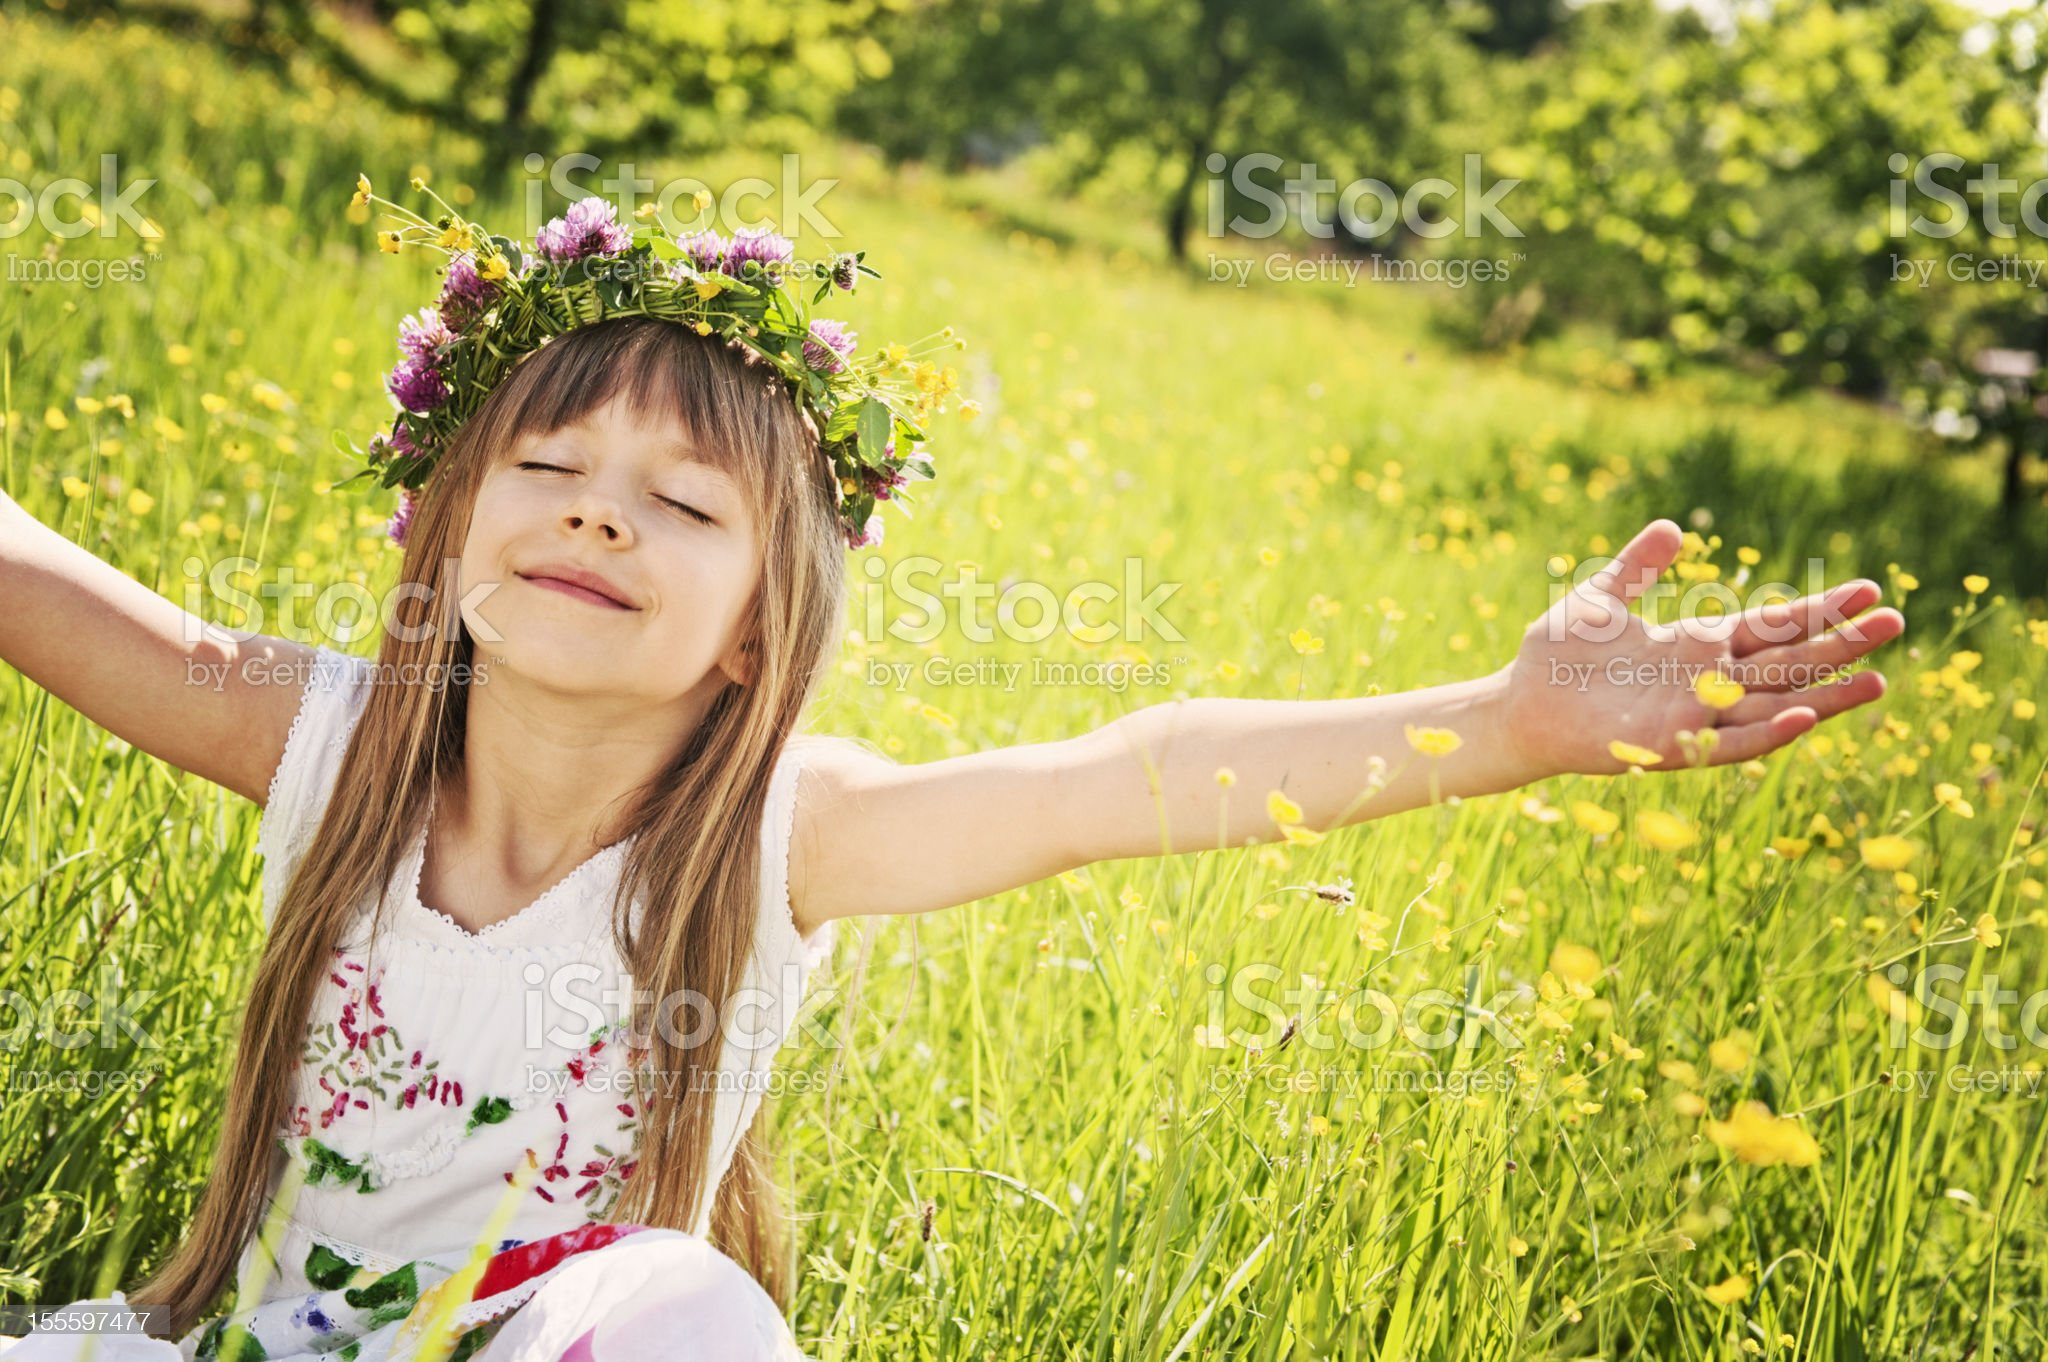 Little girl enjoying spring royalty-free stock photo